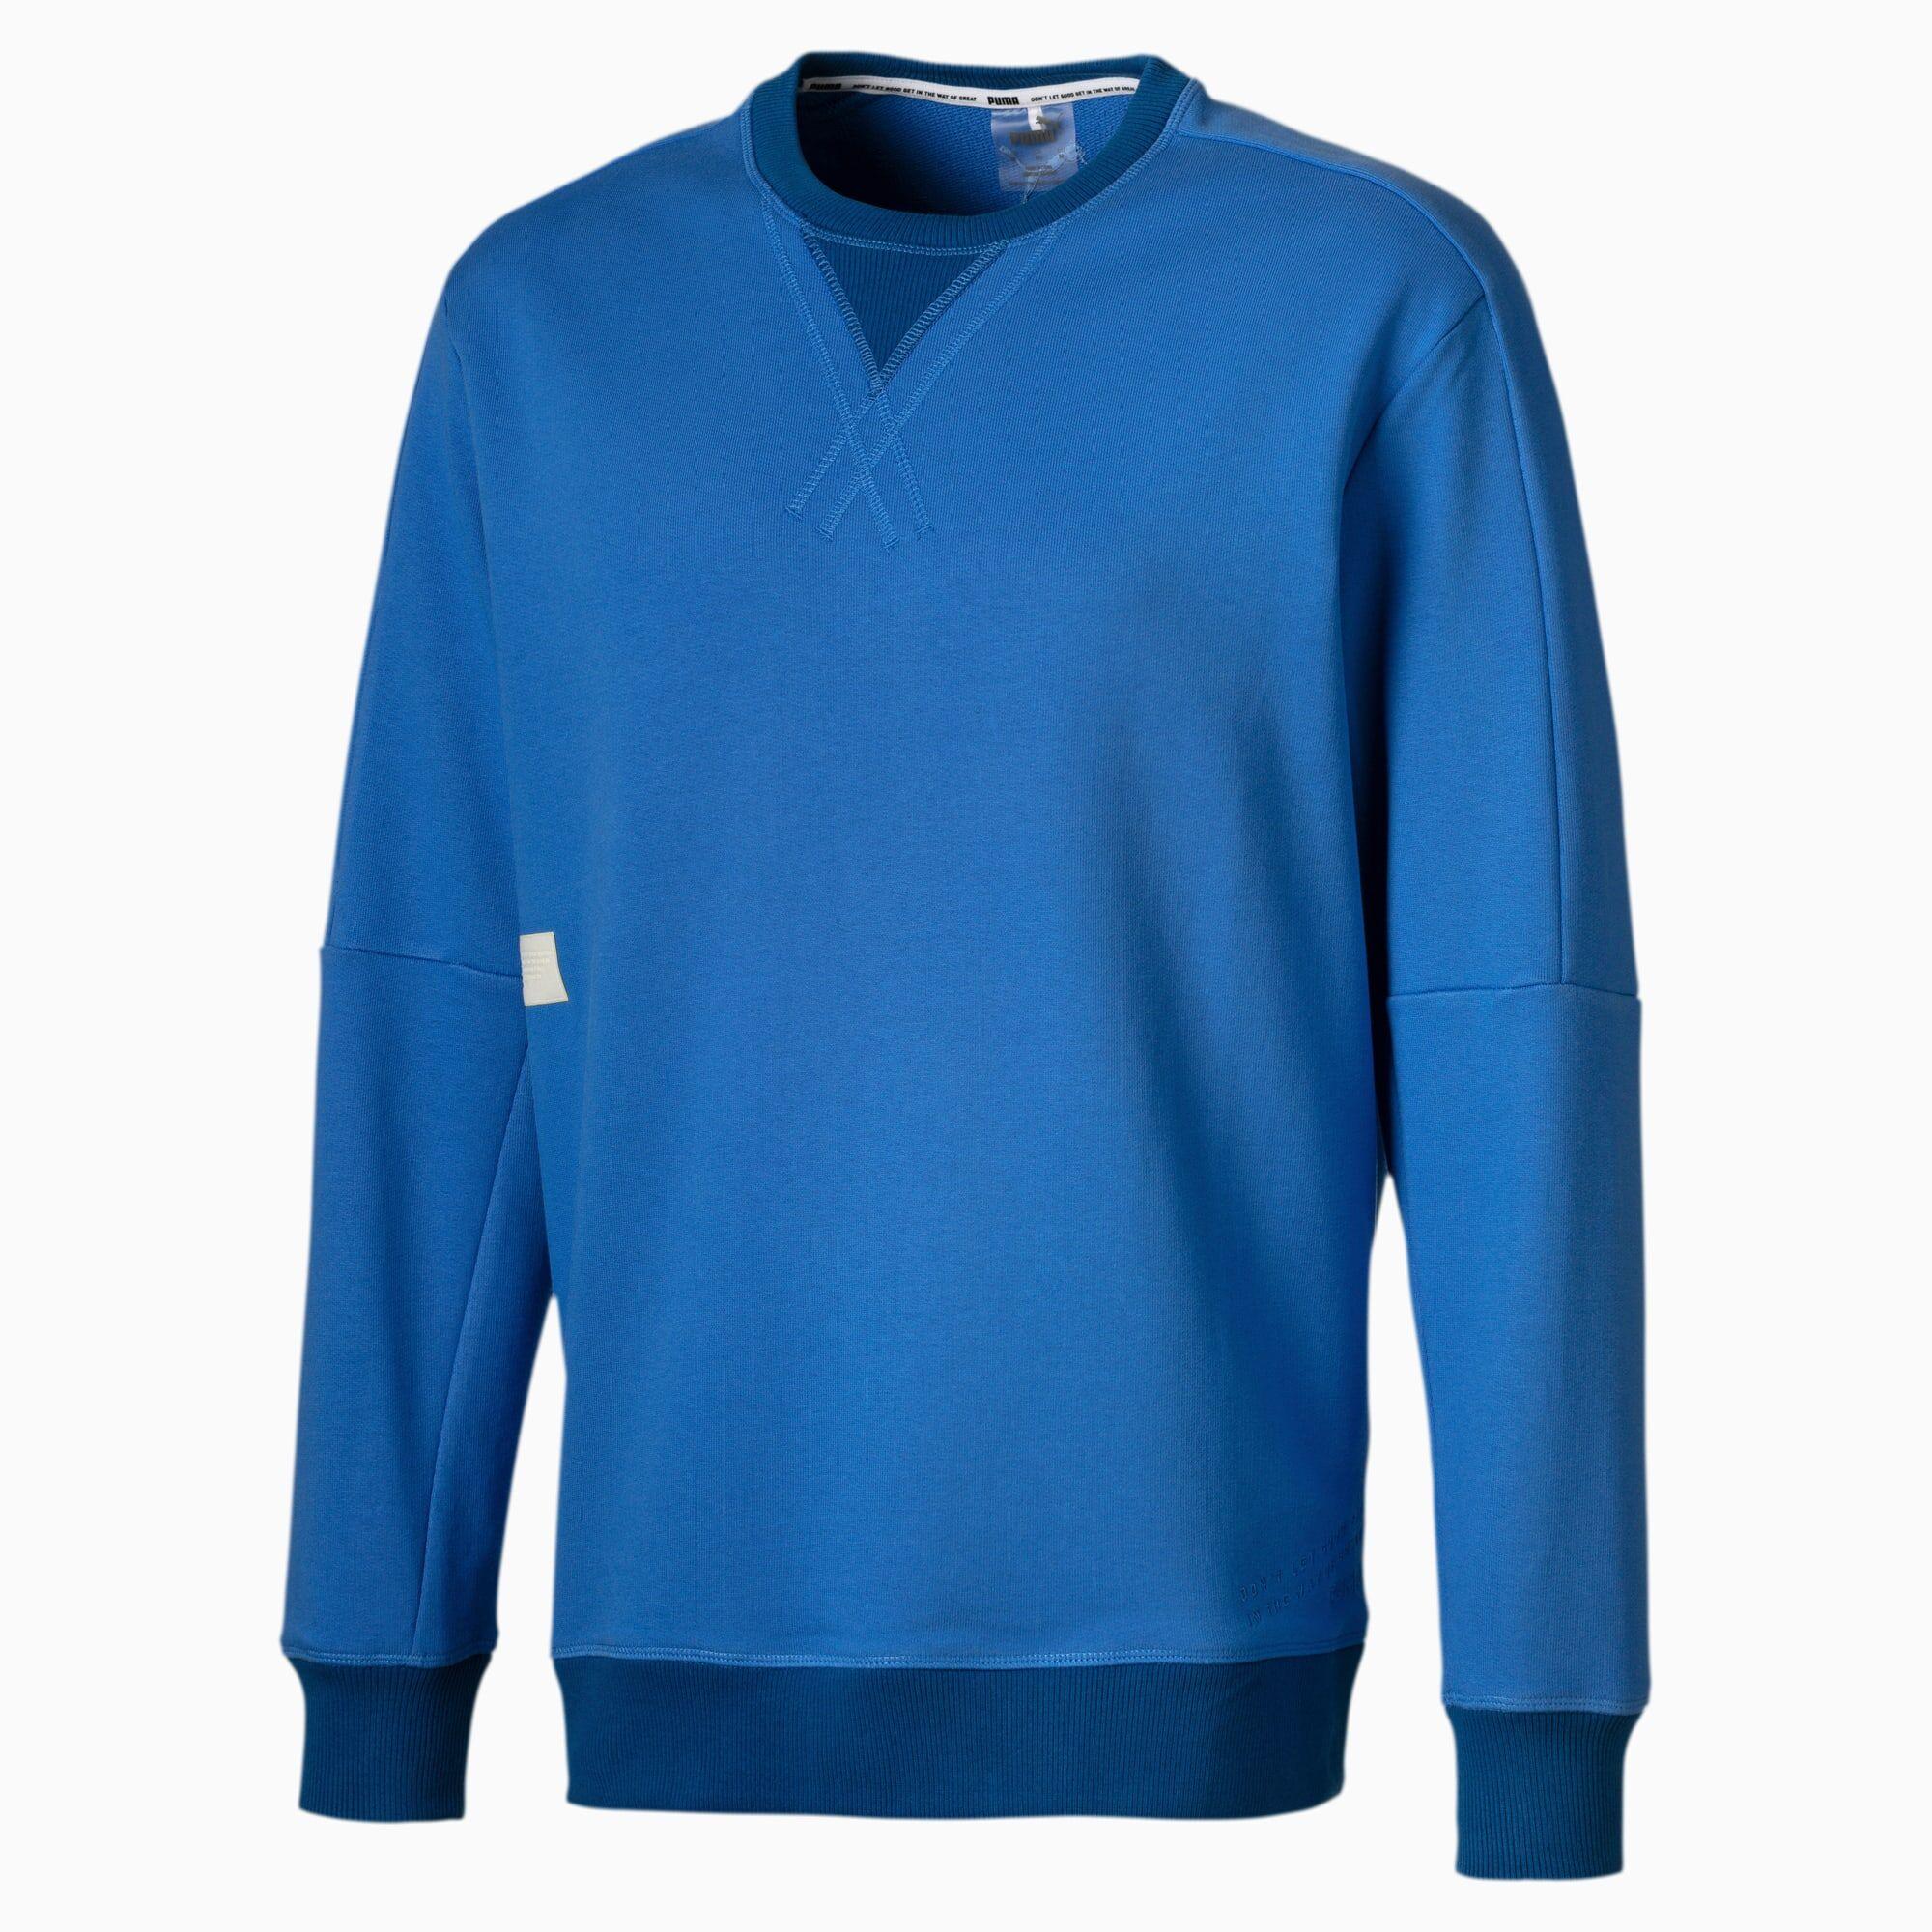 PUMA Sweat Jump Hook Basketball pour Homme, Bleu, Taille 3XL, Vêtements